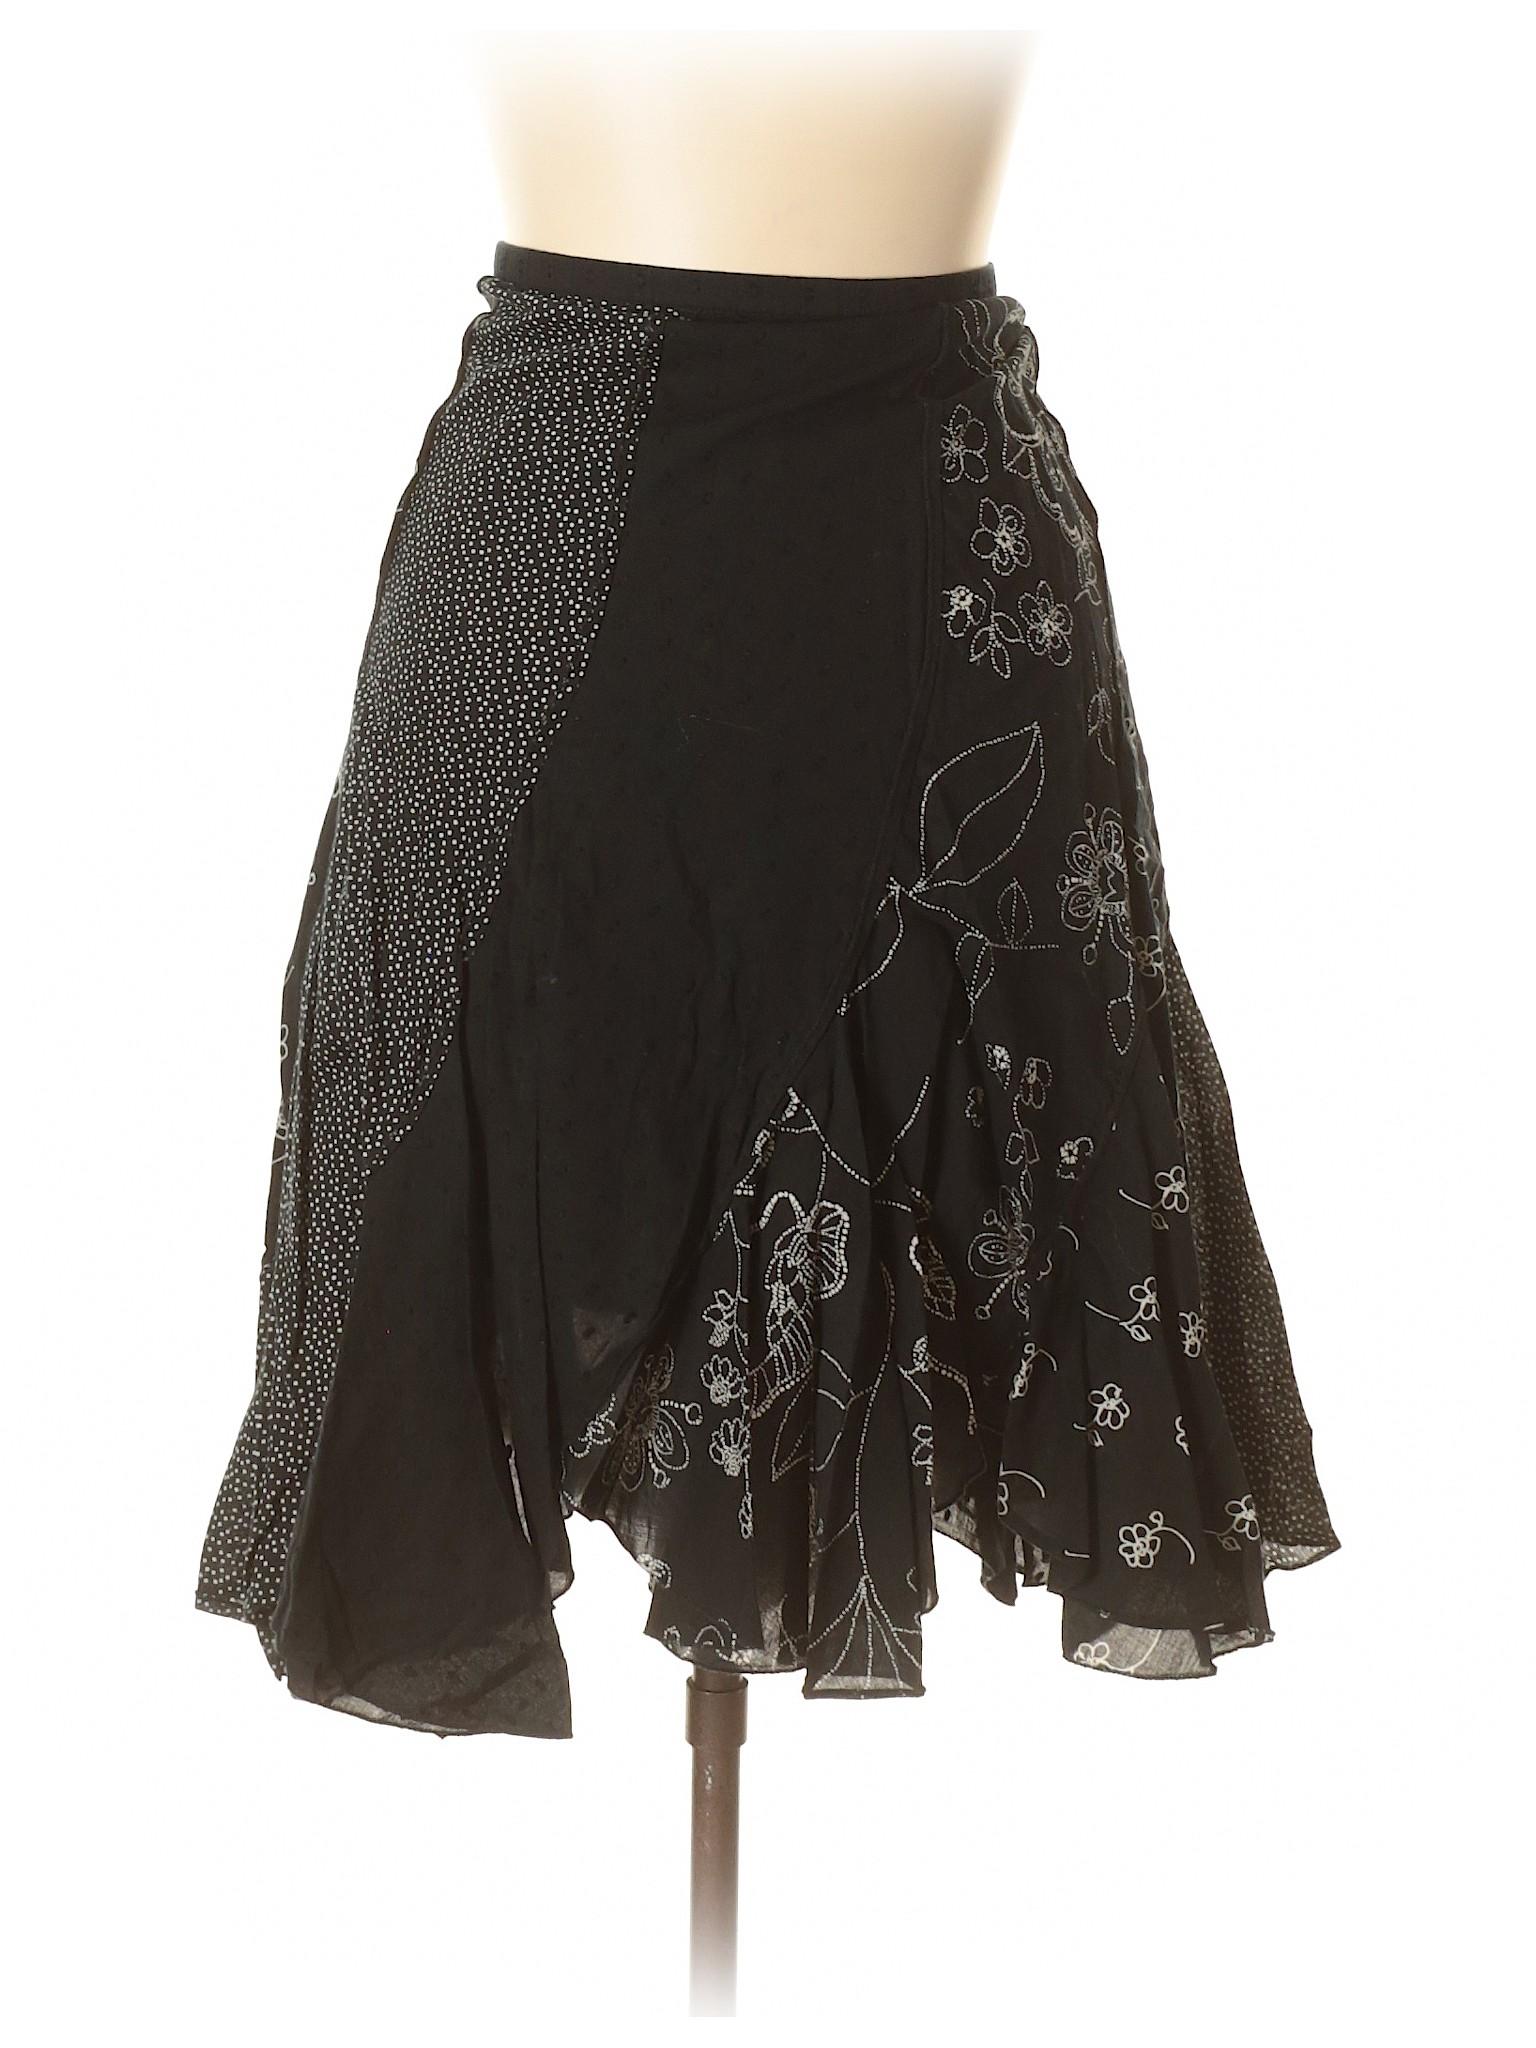 Skirt Boutique Casual Skirt Skirt Boutique Boutique Skirt Boutique Skirt Boutique Casual Casual Boutique Casual Casual Casual qqfArE